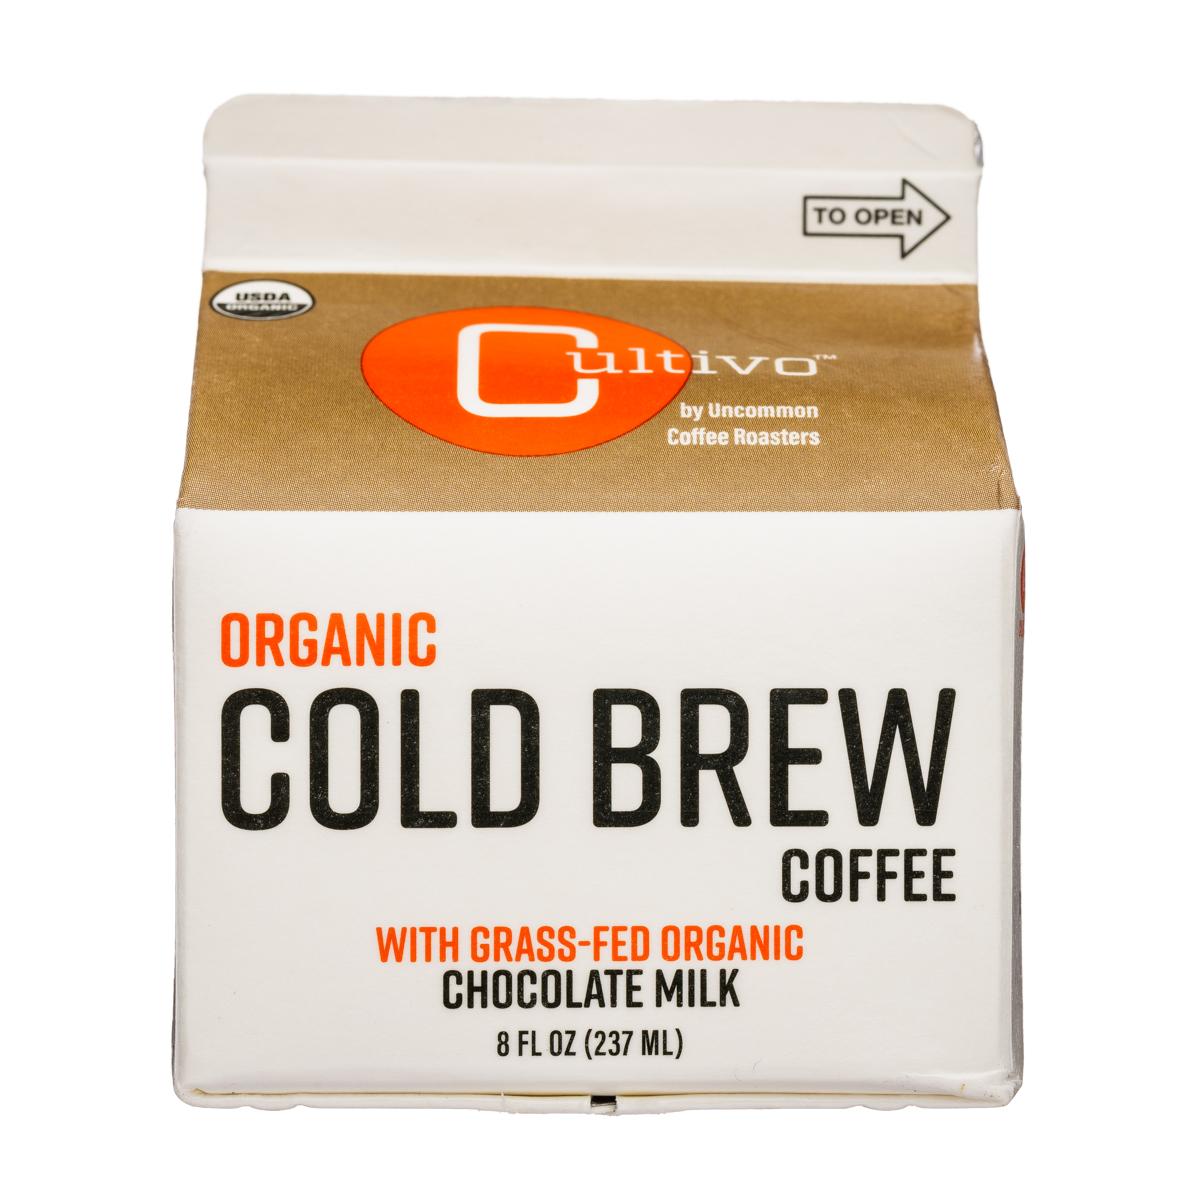 Organic Cold Brew Coffee - Chocolate Milk